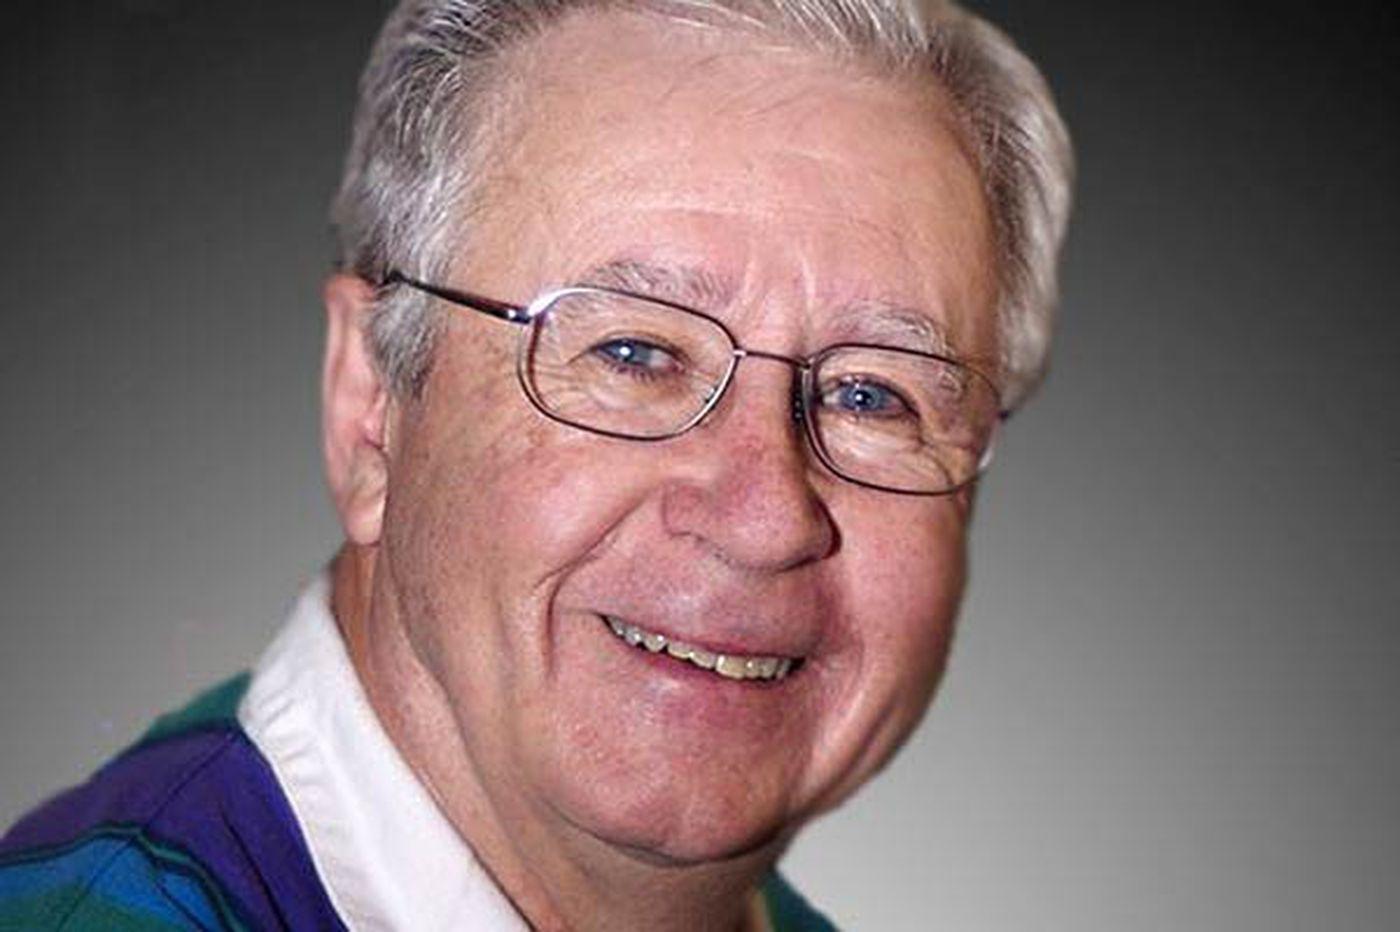 Journalist John Hilferty, 83